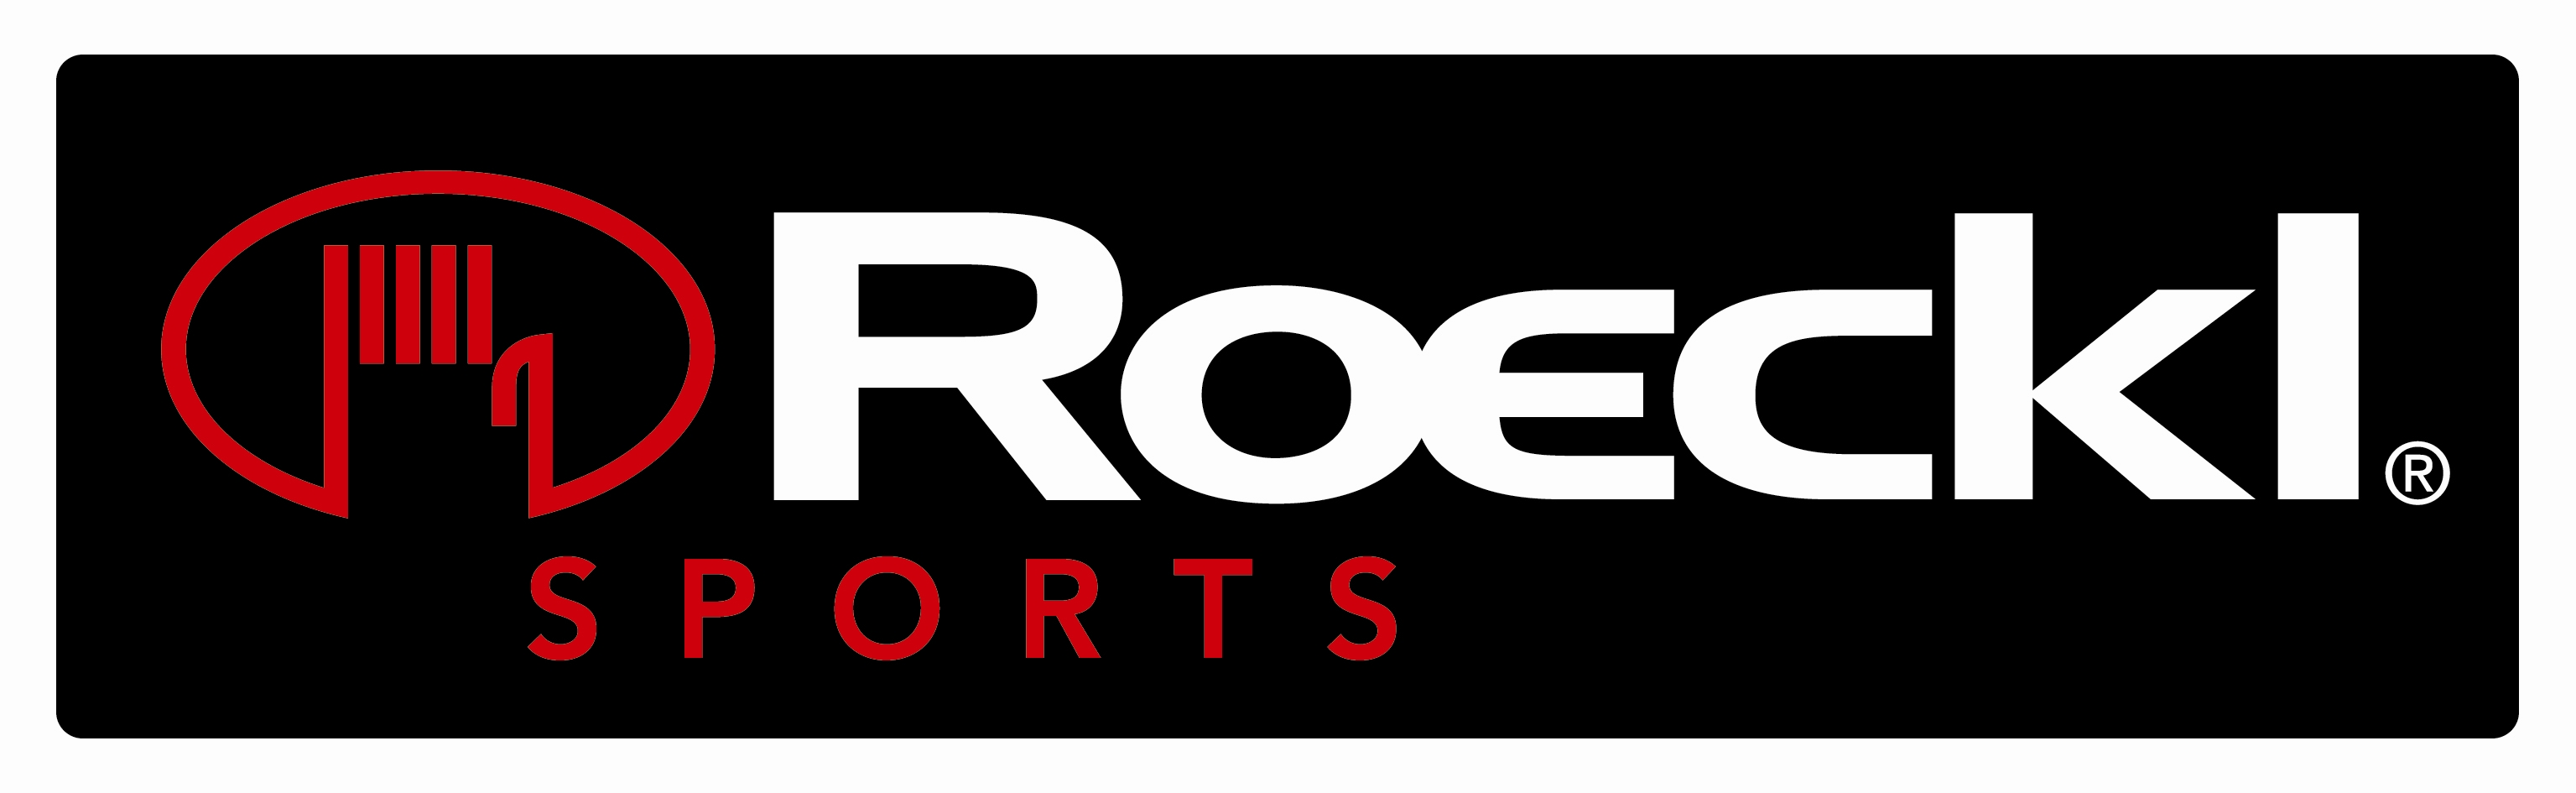 Sponsoren - Roeckl